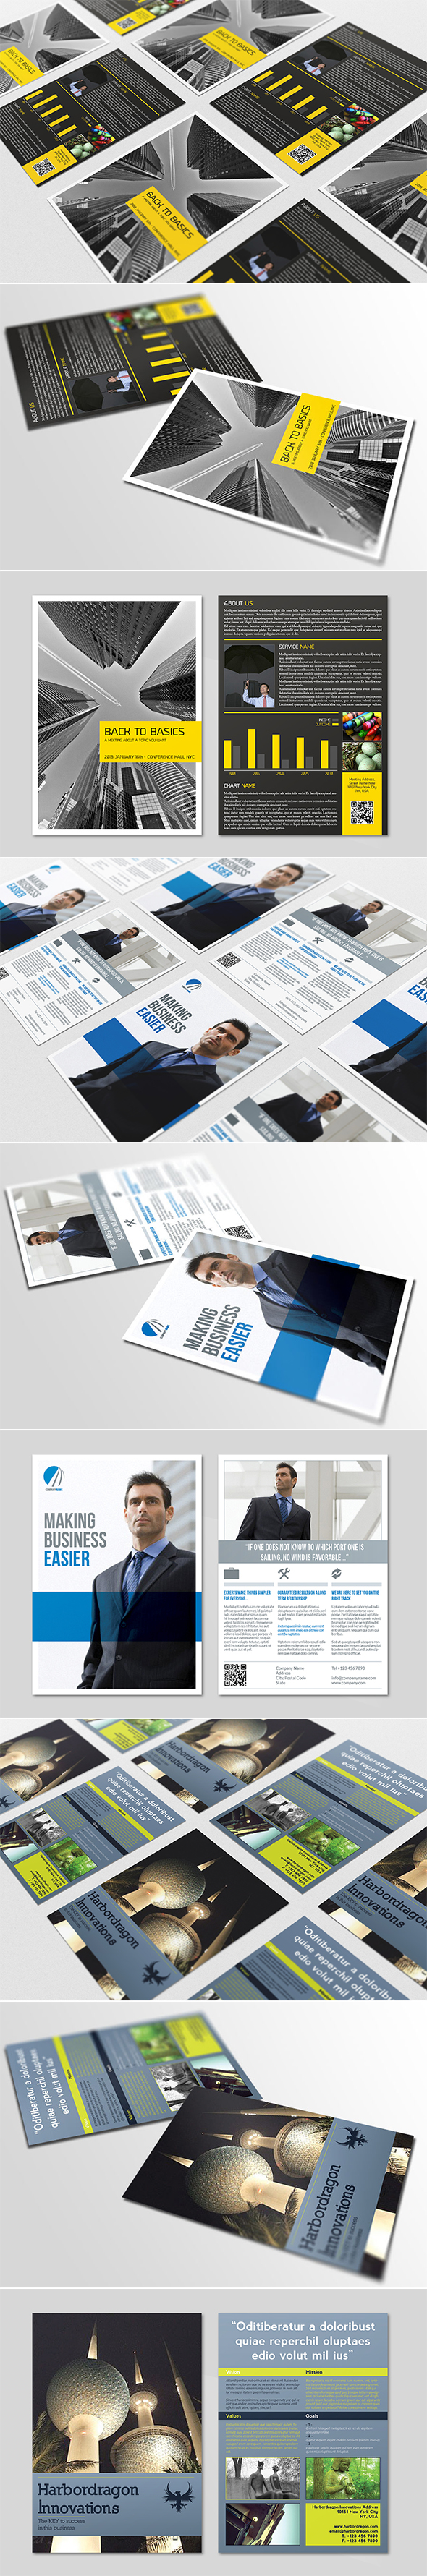 Business Flyers Bundle Pack